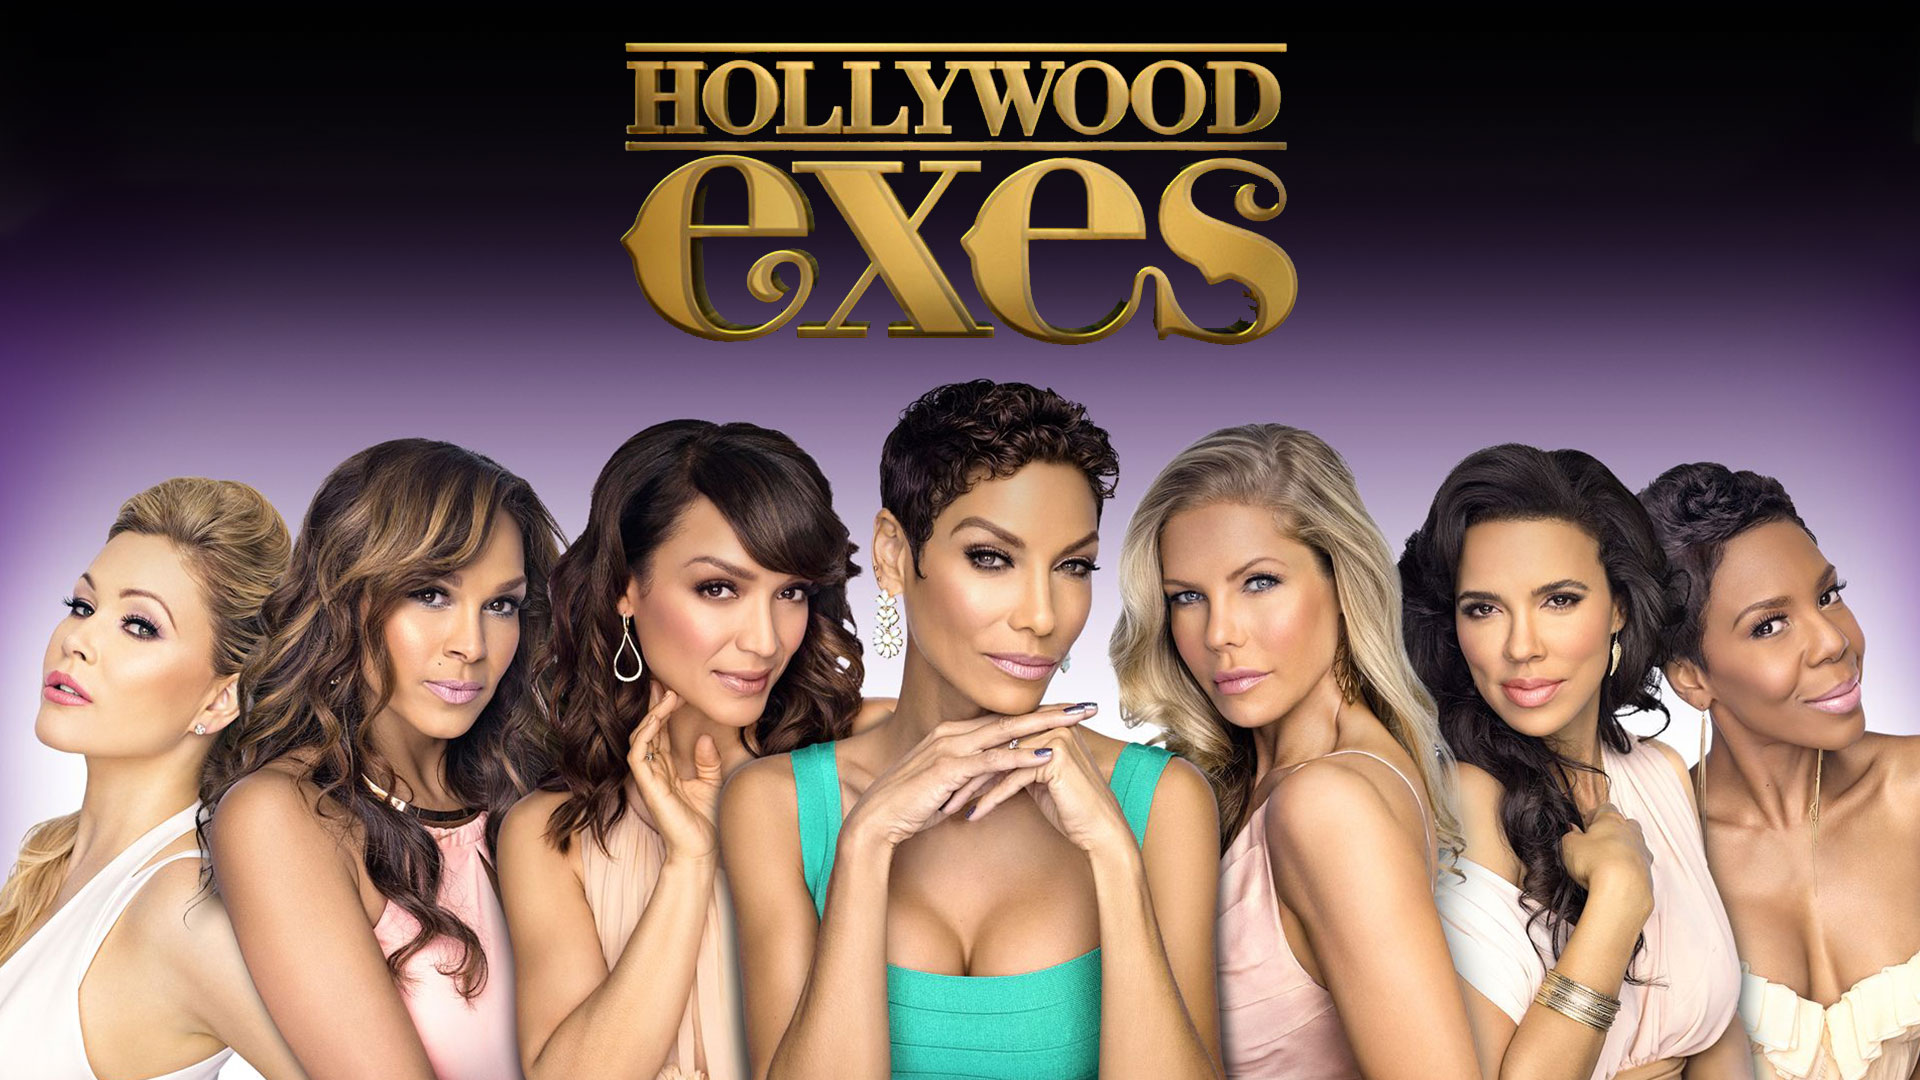 Hollywood Exes Season 1